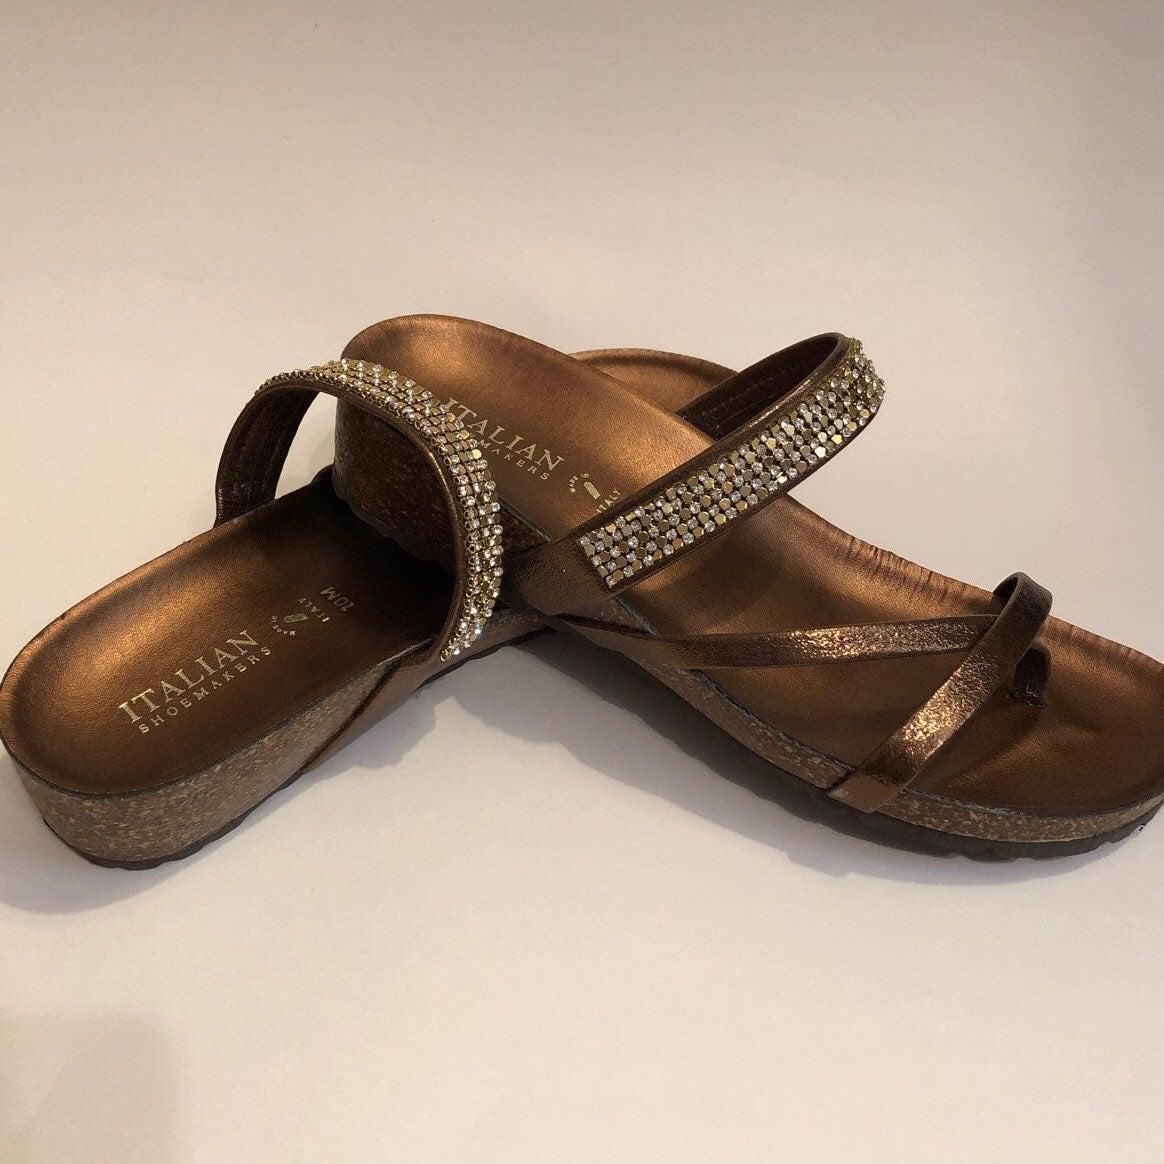 Italian Shoemakers Embellished Sandals